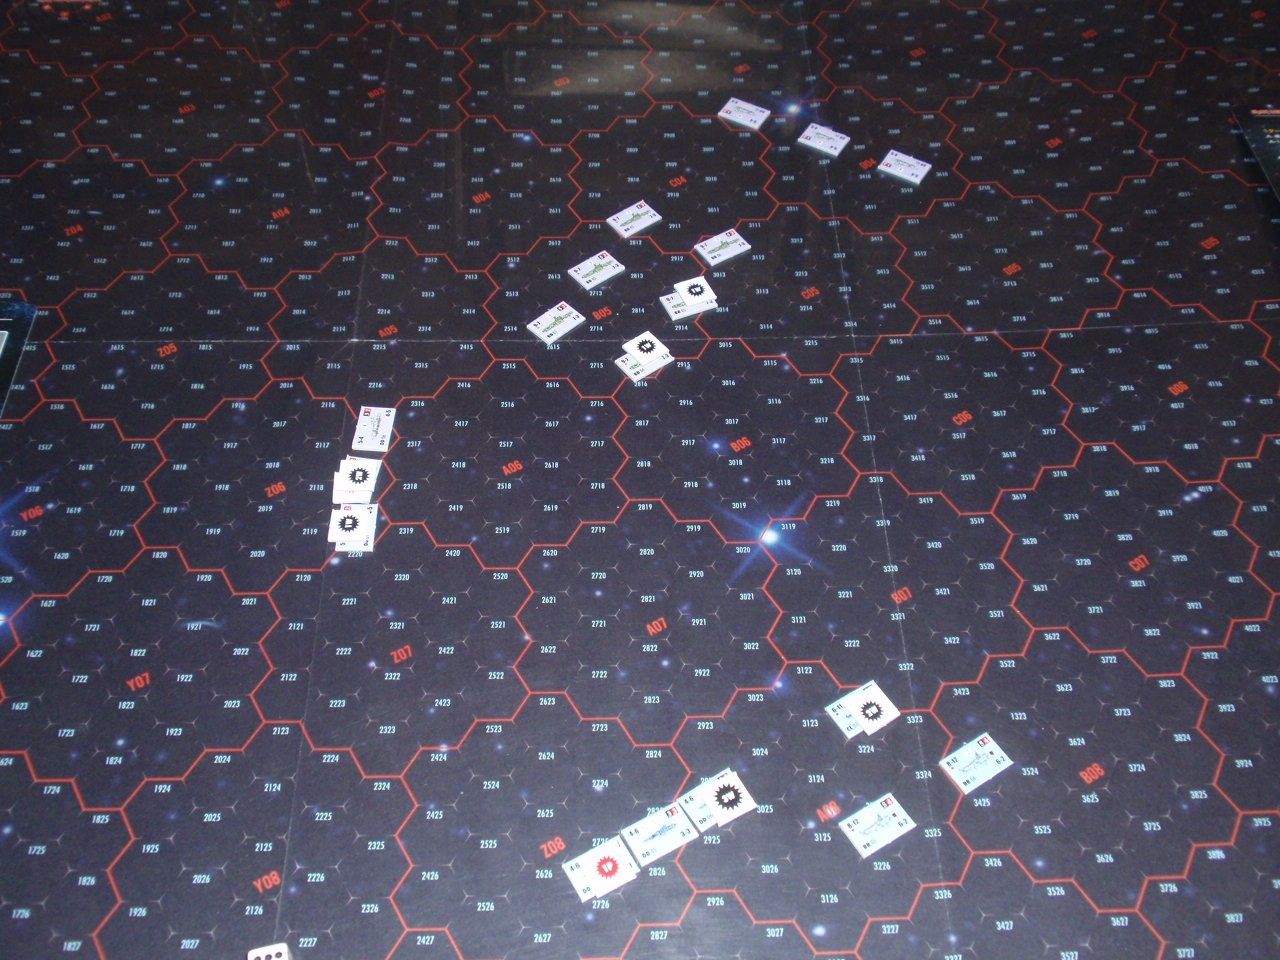 Bonsai Games「アイアン・デブリ・システム」よりシナリオ「全滅!ヒペリオン艦隊」をソロプレイ②_b0162202_1935540.jpg